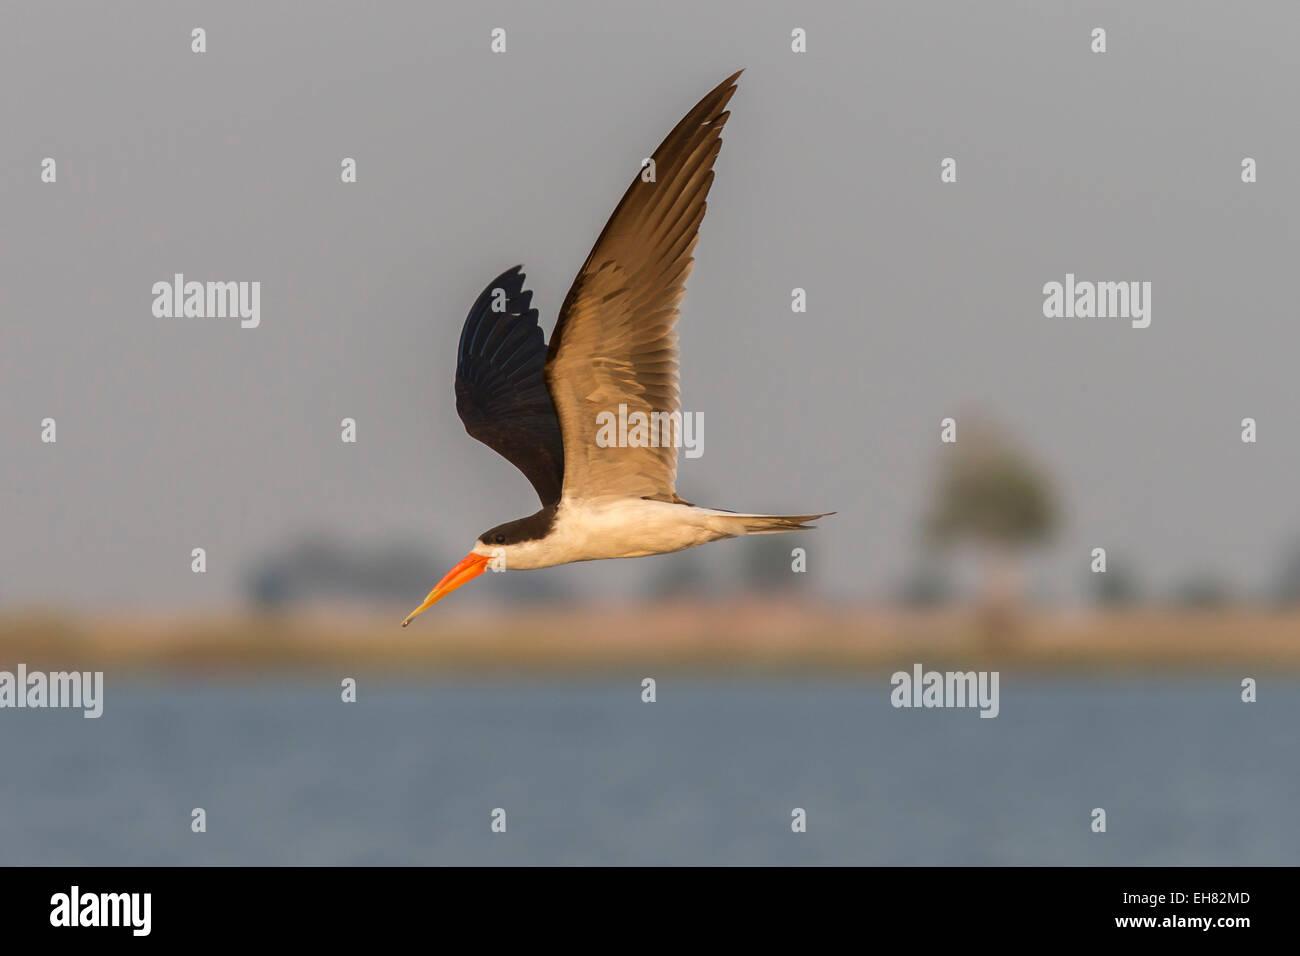 African skimmer (Rynchops flavirostris), in flight, Chobe National Park, Botswana, Africa - Stock Image